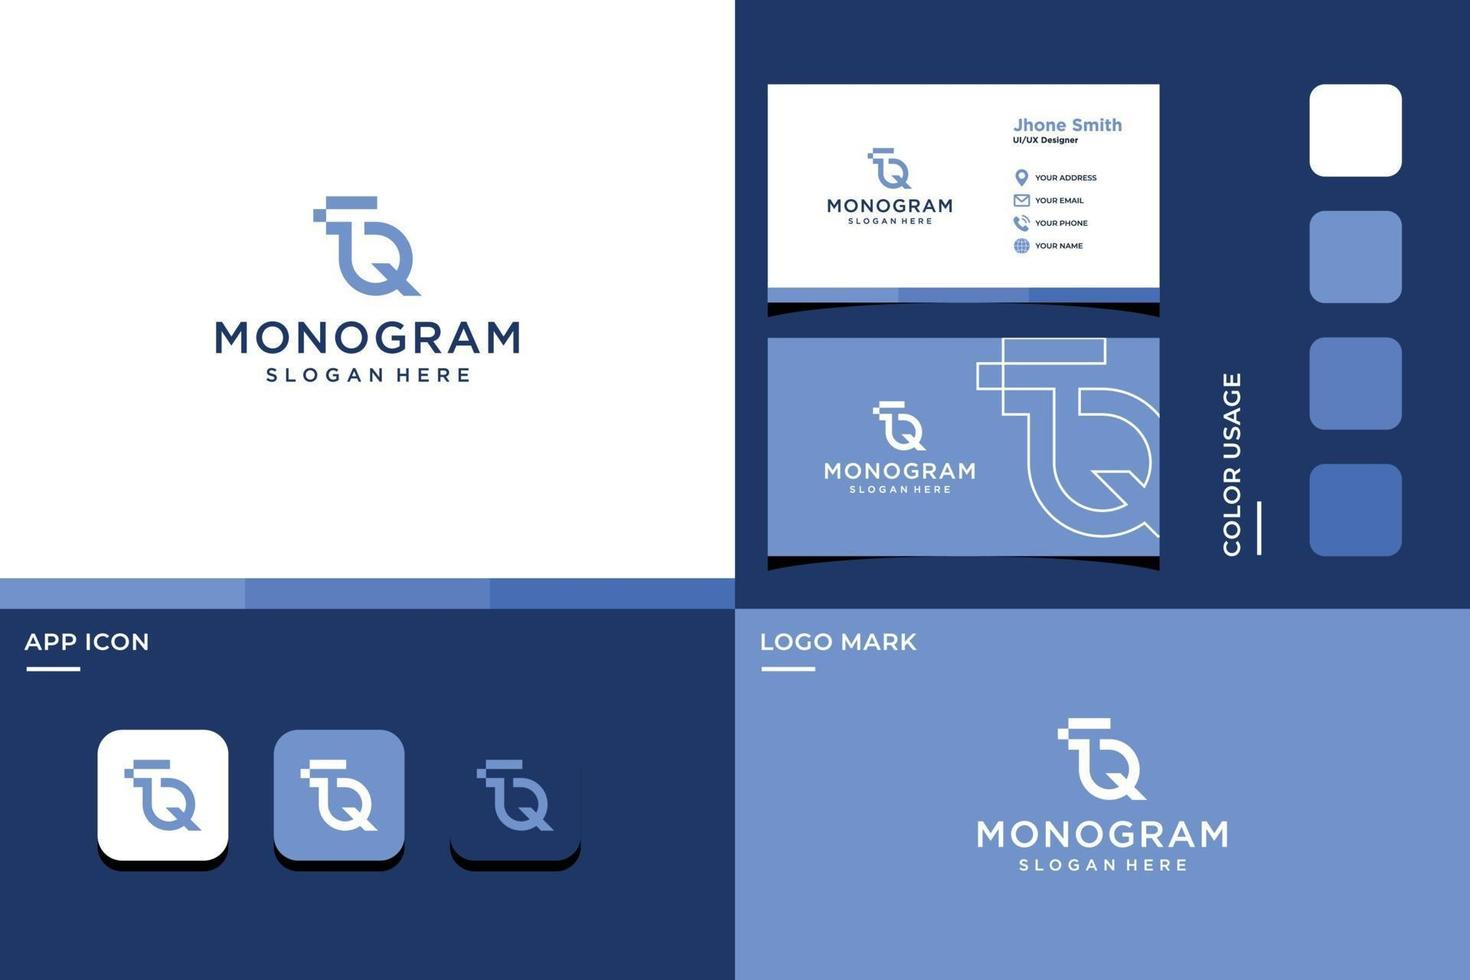 letter T and Q monogram logo vector